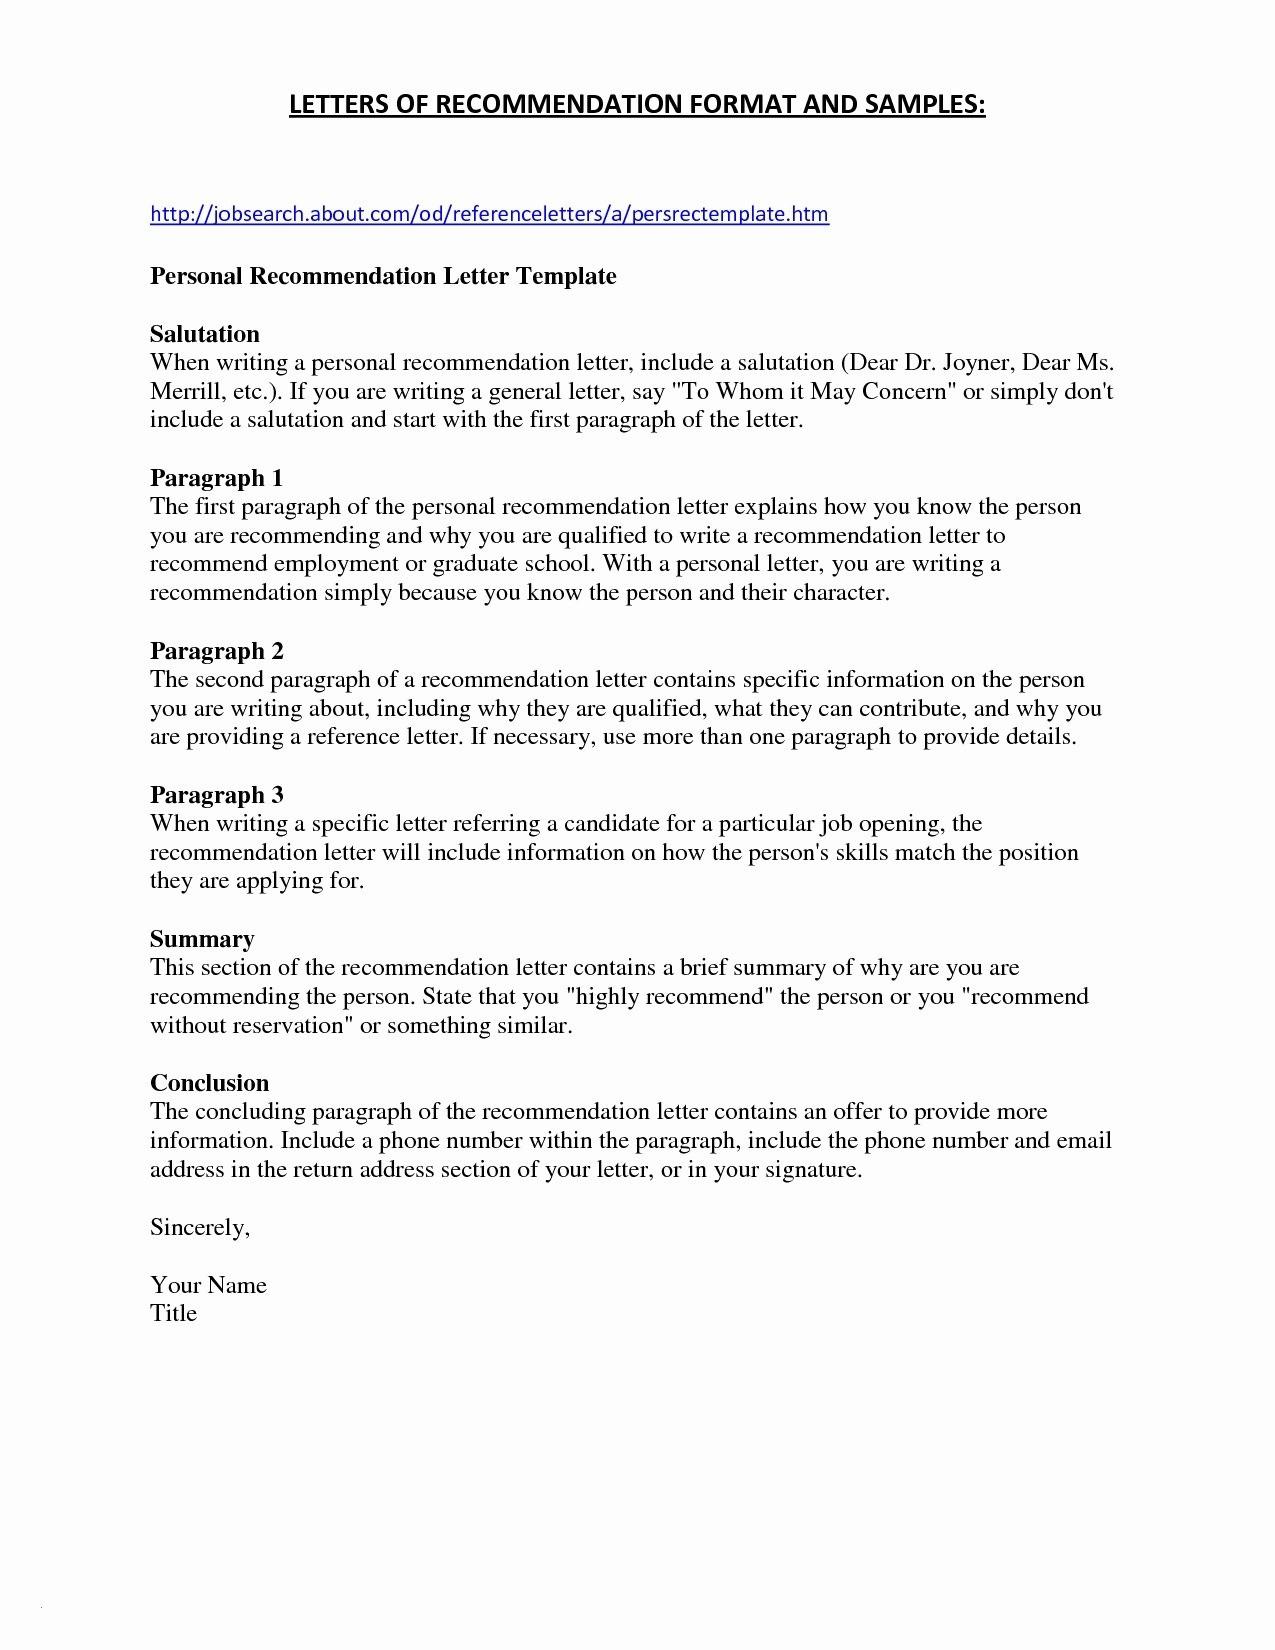 Microsoft Word Letter Of Recommendation Template - Job Re Mendation Letter Best Bination Resume formats Unique Resume